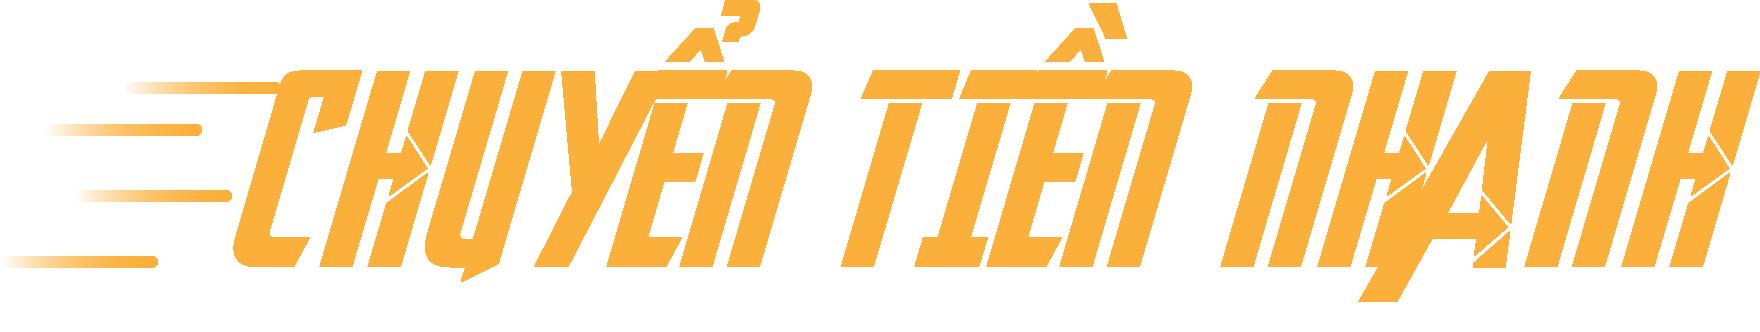 Logo for CHUYỂN TIỀN NHANH